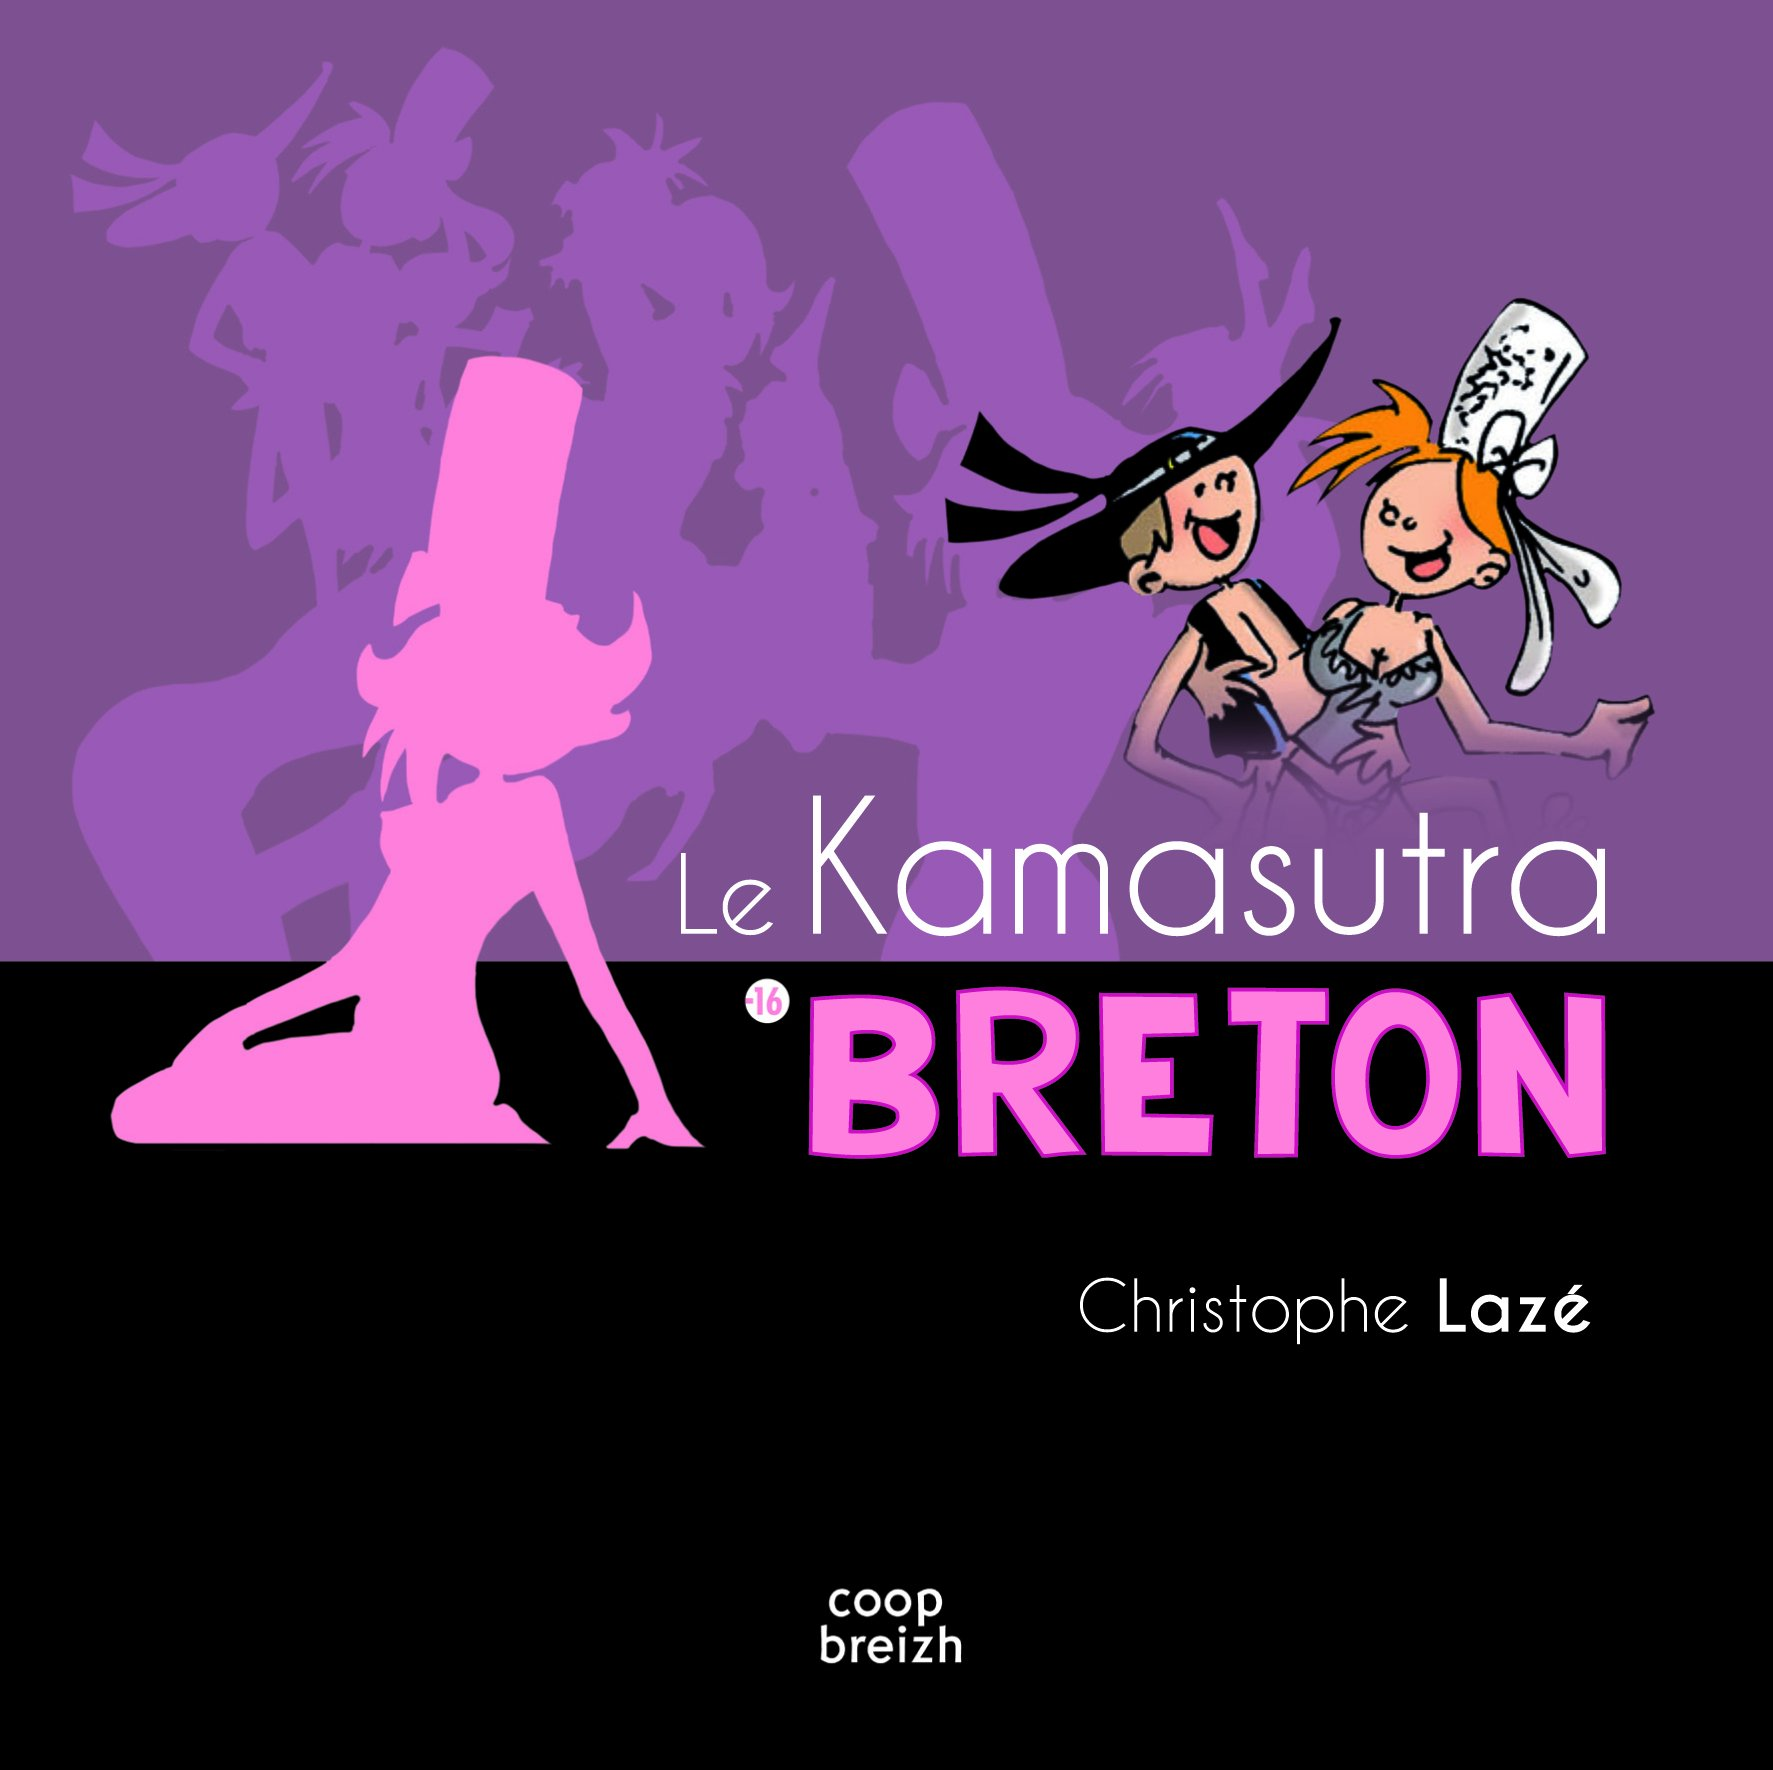 Le Kamasutra breton Broché – 22 juin 2016 Christophe Lazé Coop Breizh 2843468027 Couple